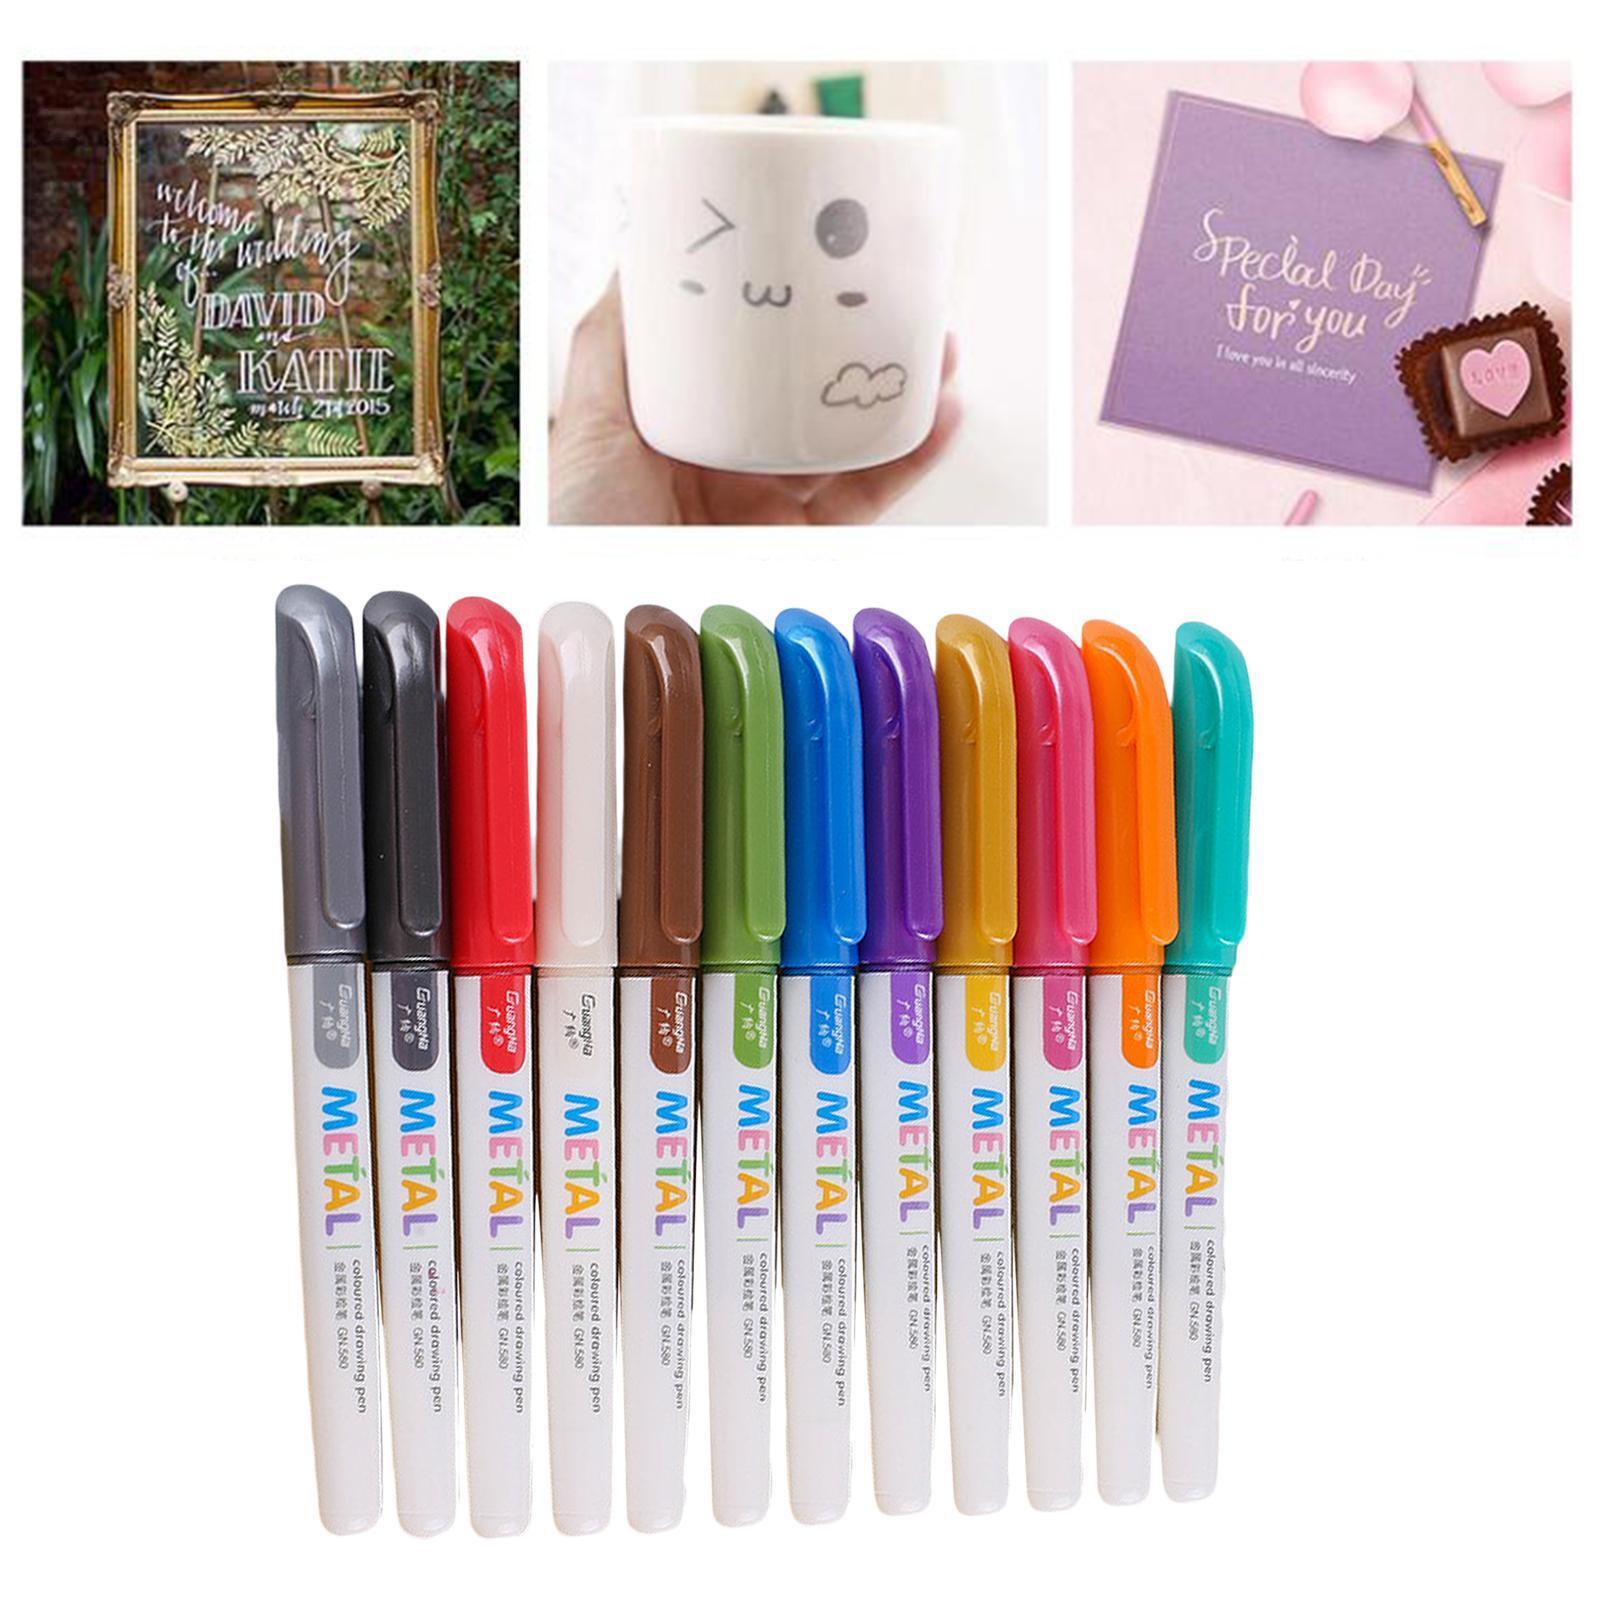 miniatura 17 - 8-12-20x-Permanente-Metallic-Marcatori-Vernici-Penne-per-Adulti-Colouring